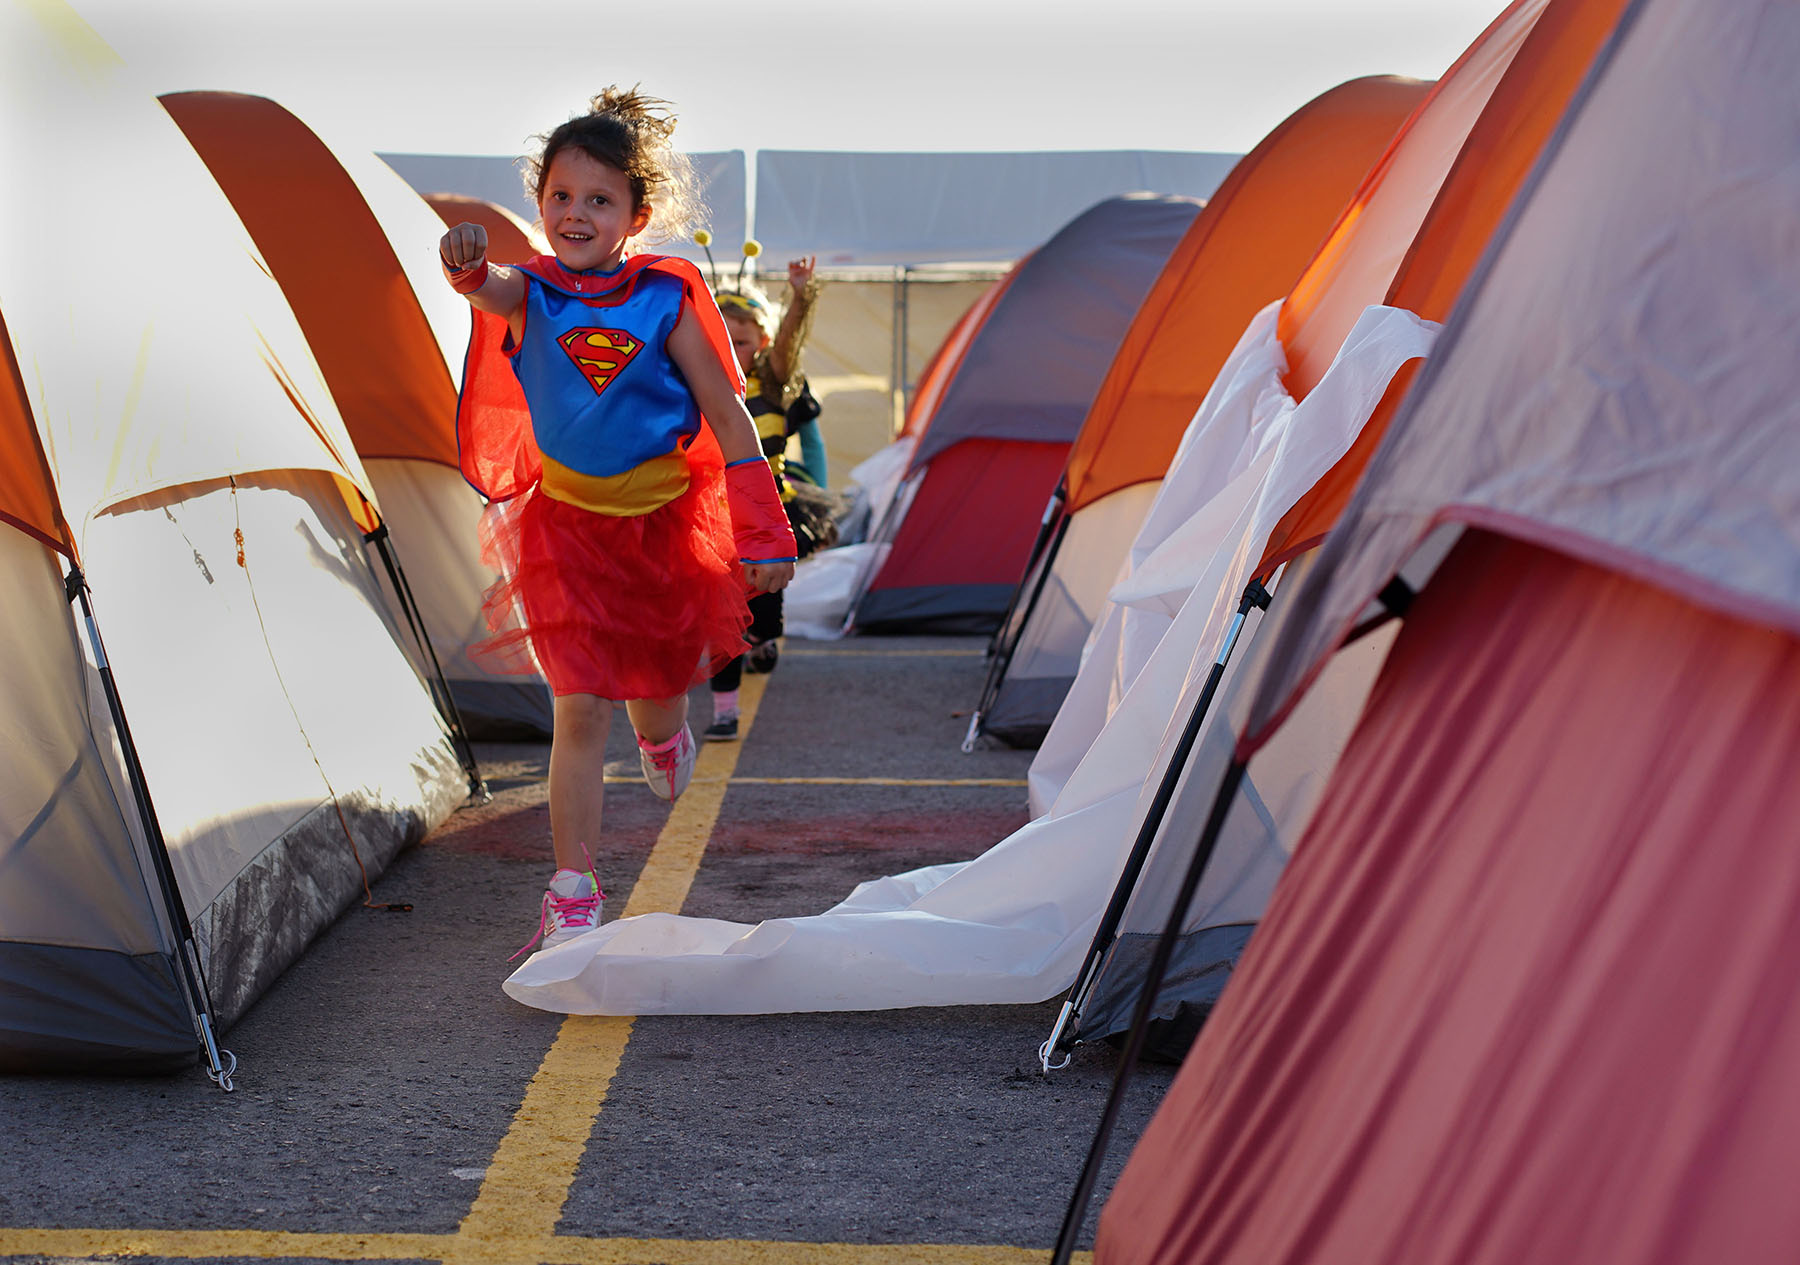 CampgroundHalloweenTOTSx003.jpg